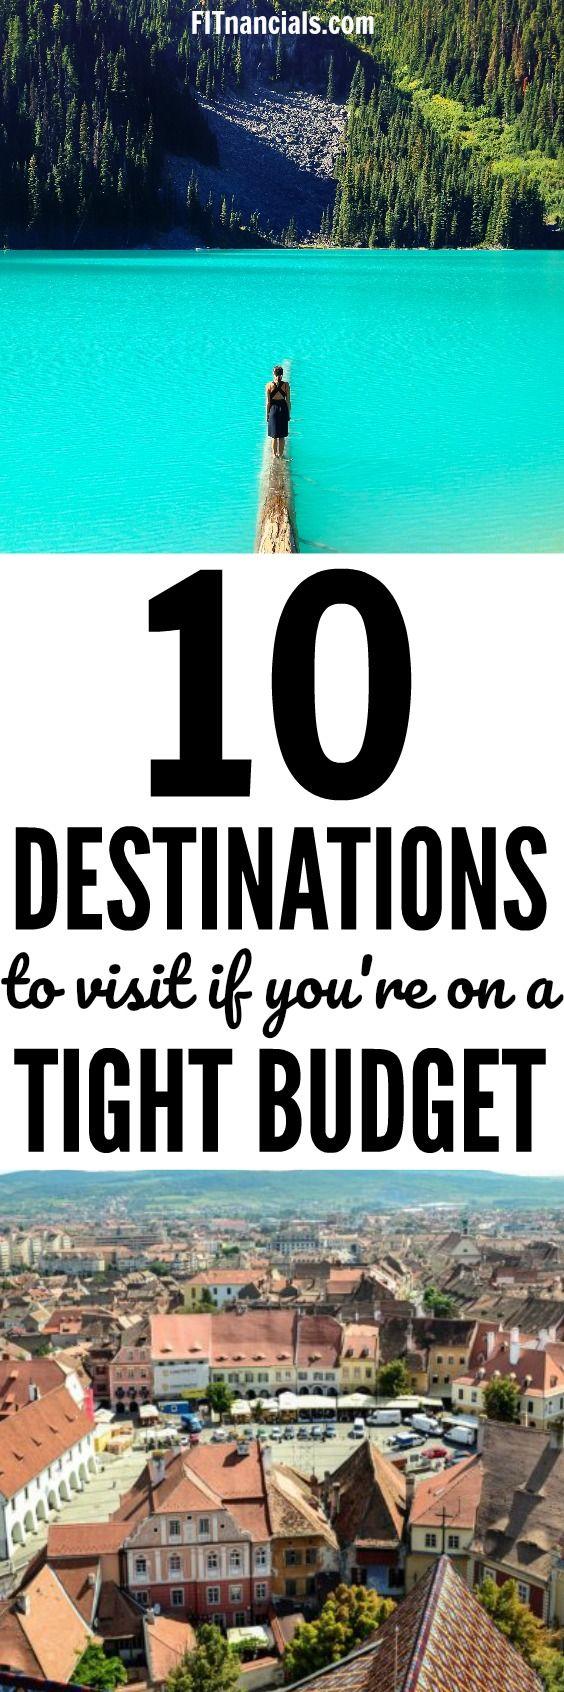 10 Destinations For A Tight Budget via @fitnancials